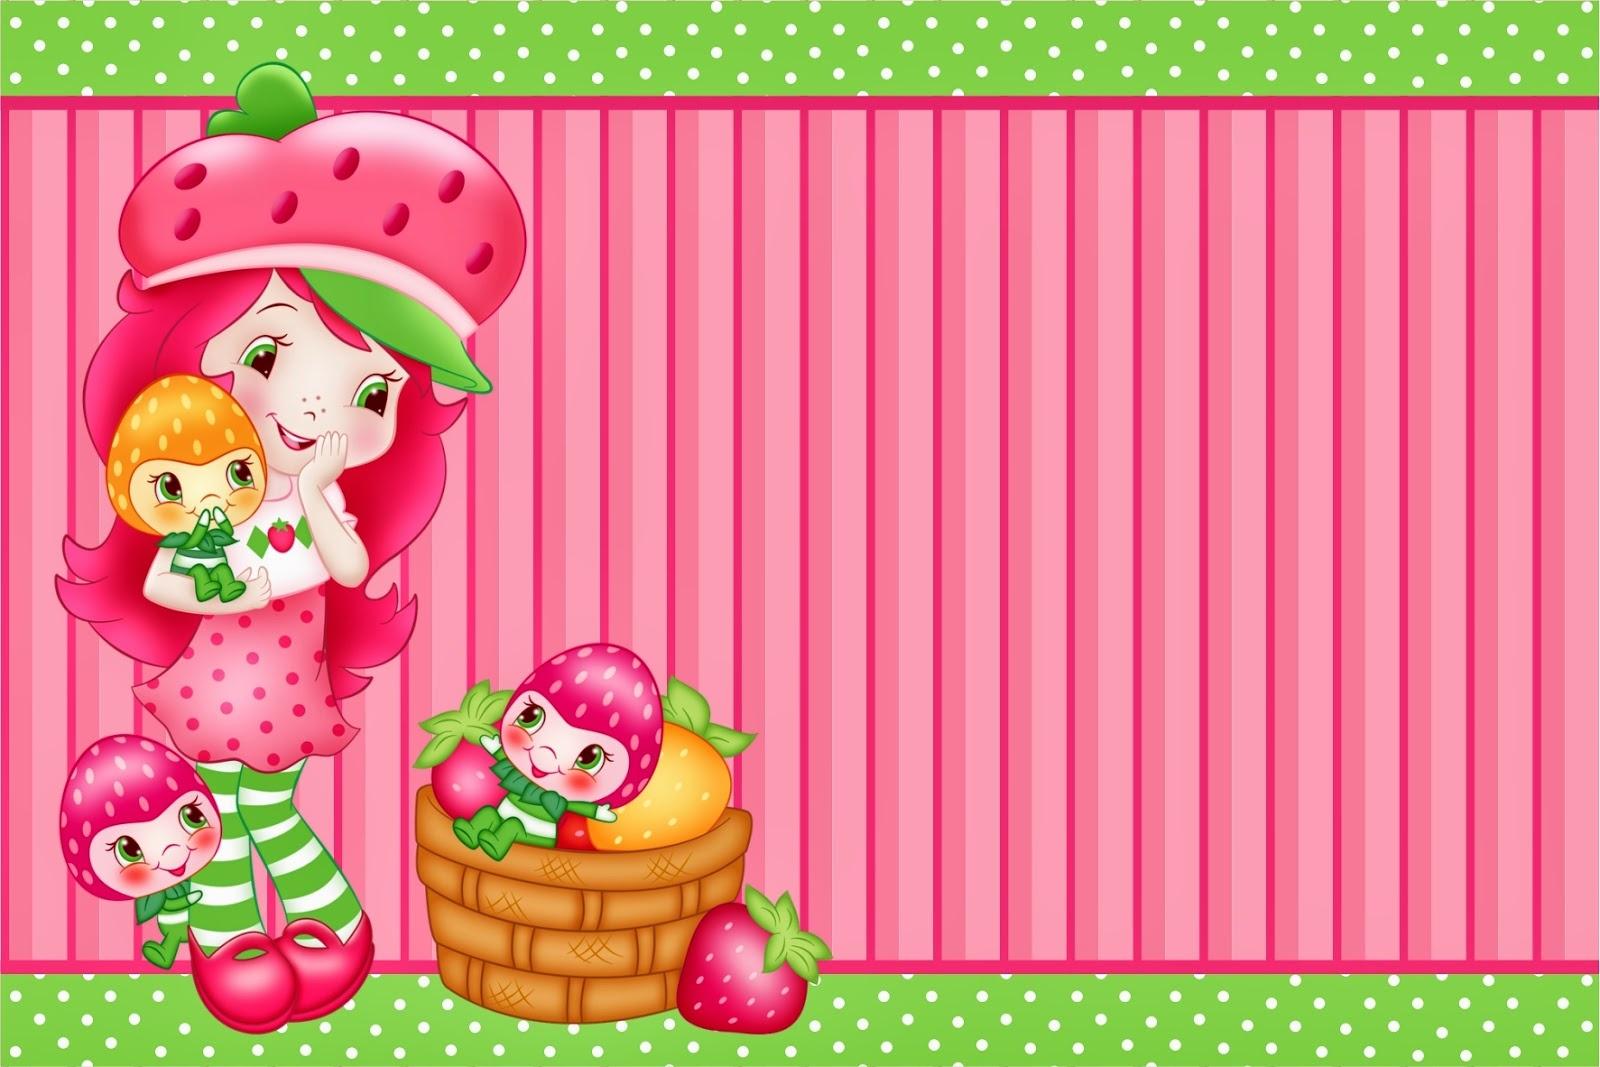 Strawberry Shortcake Free Printable Mini Kit. - Oh My Fiesta! In English - Strawberry Shortcake Birthday Cards Free Printable